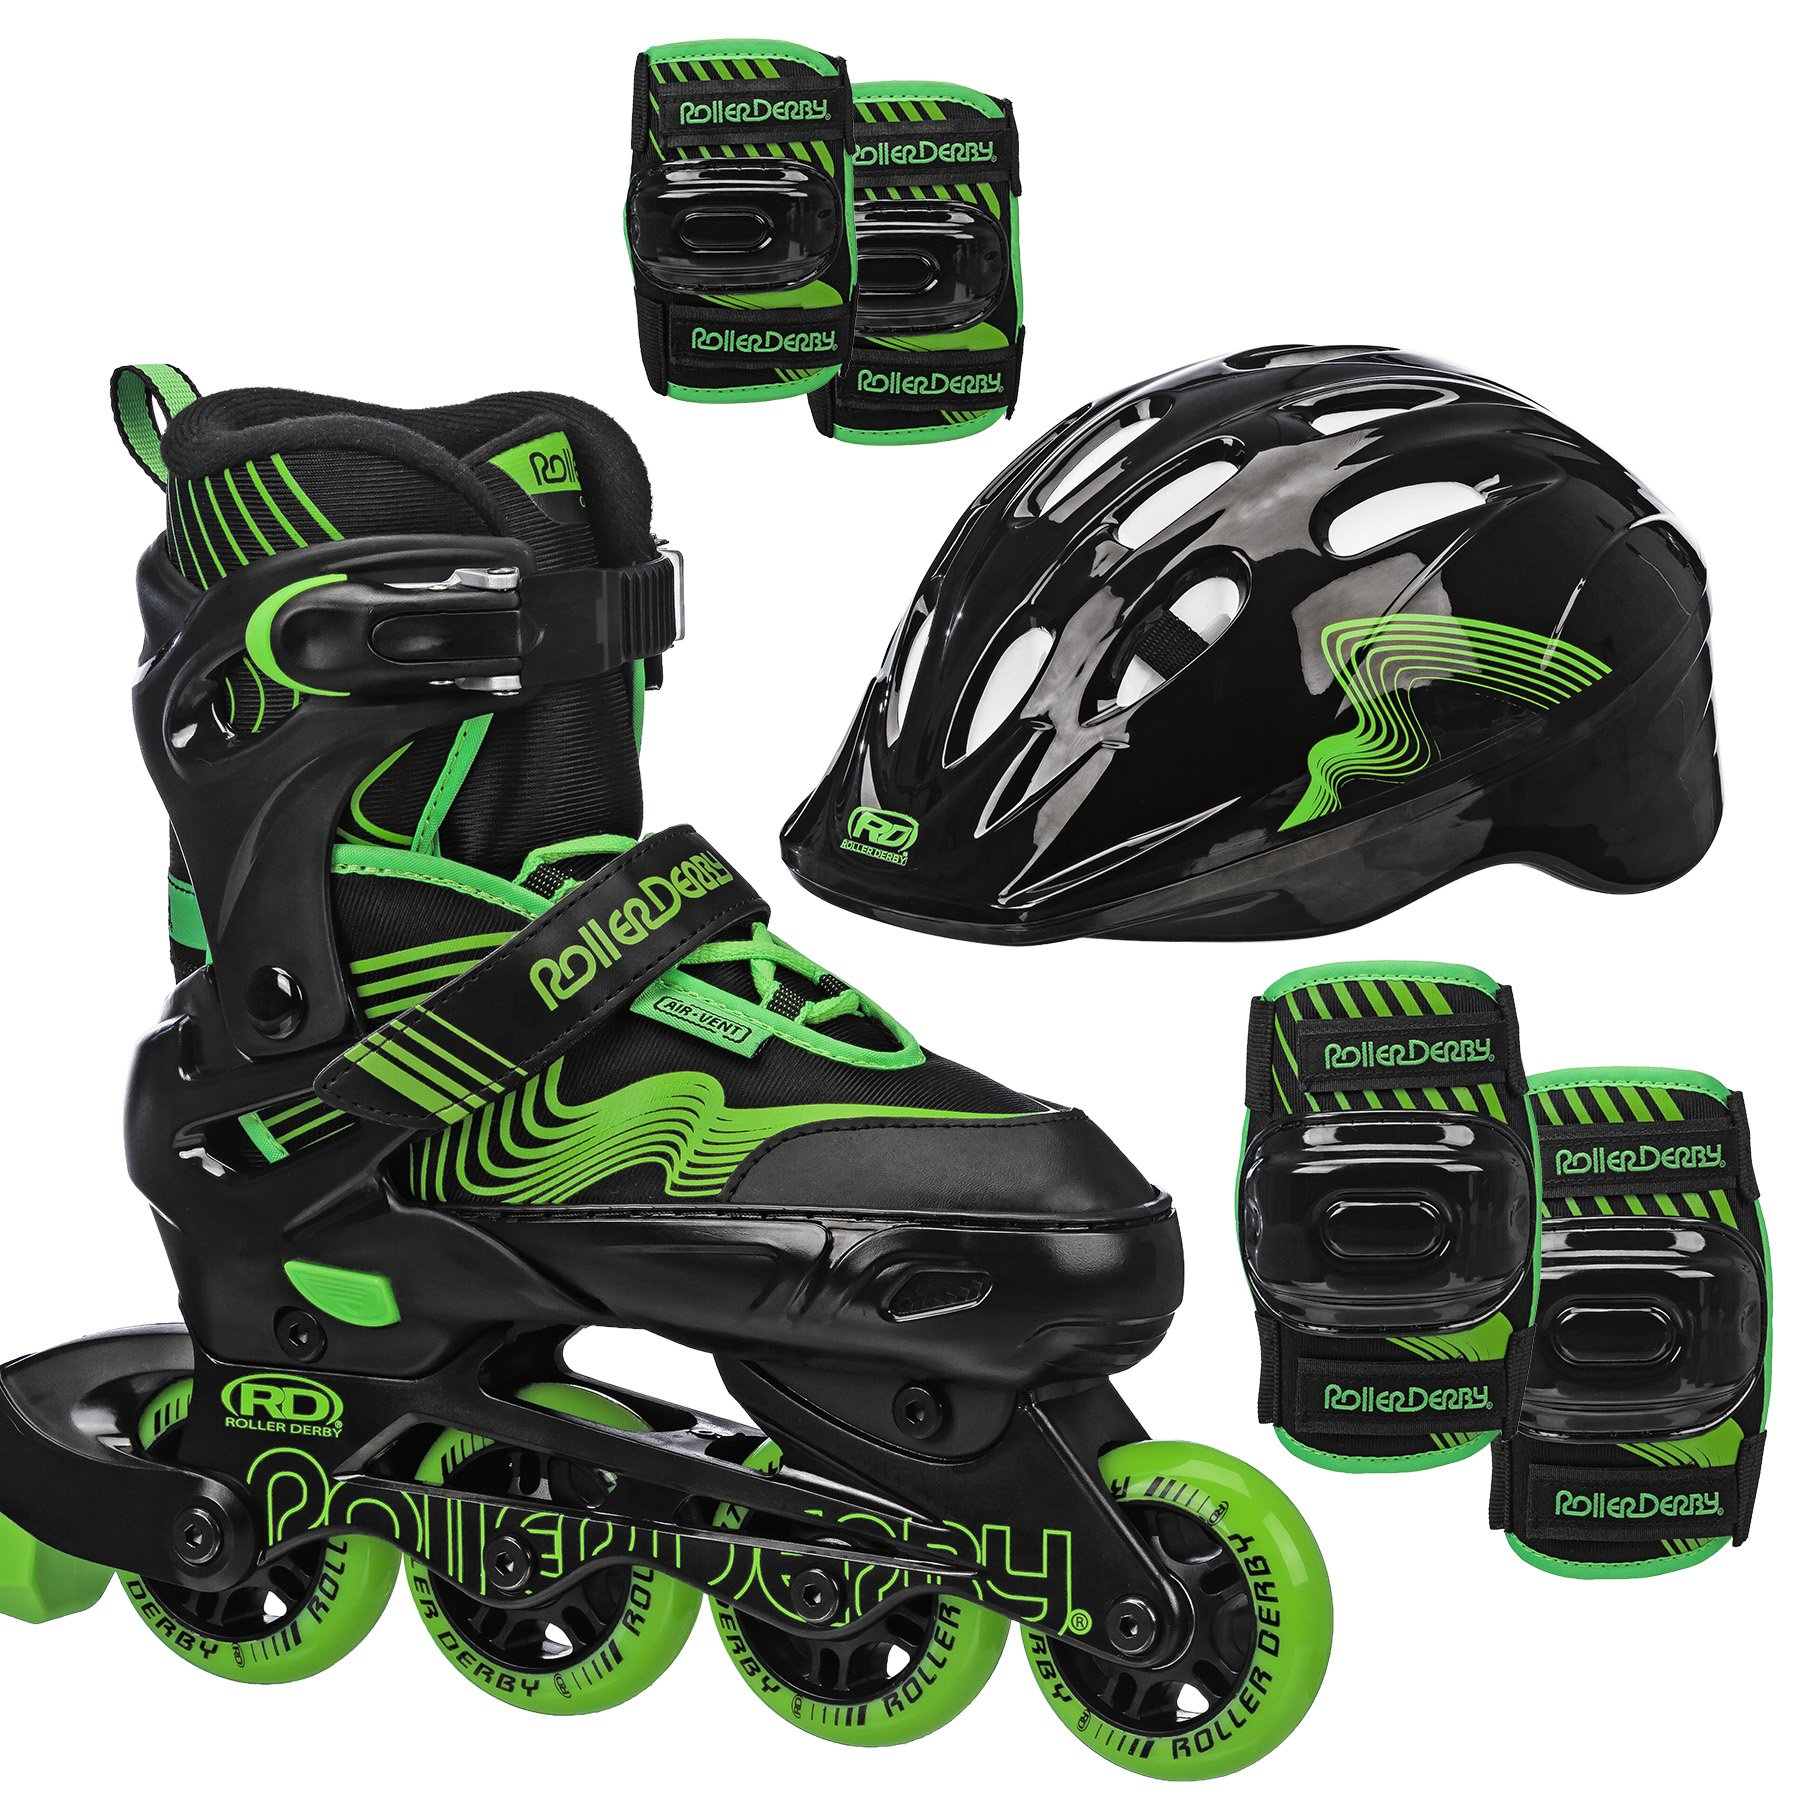 Roller Derby Carver Boys Inline Skates and Protective Pack (Helmet, Elbow Pads, Knee Pads)